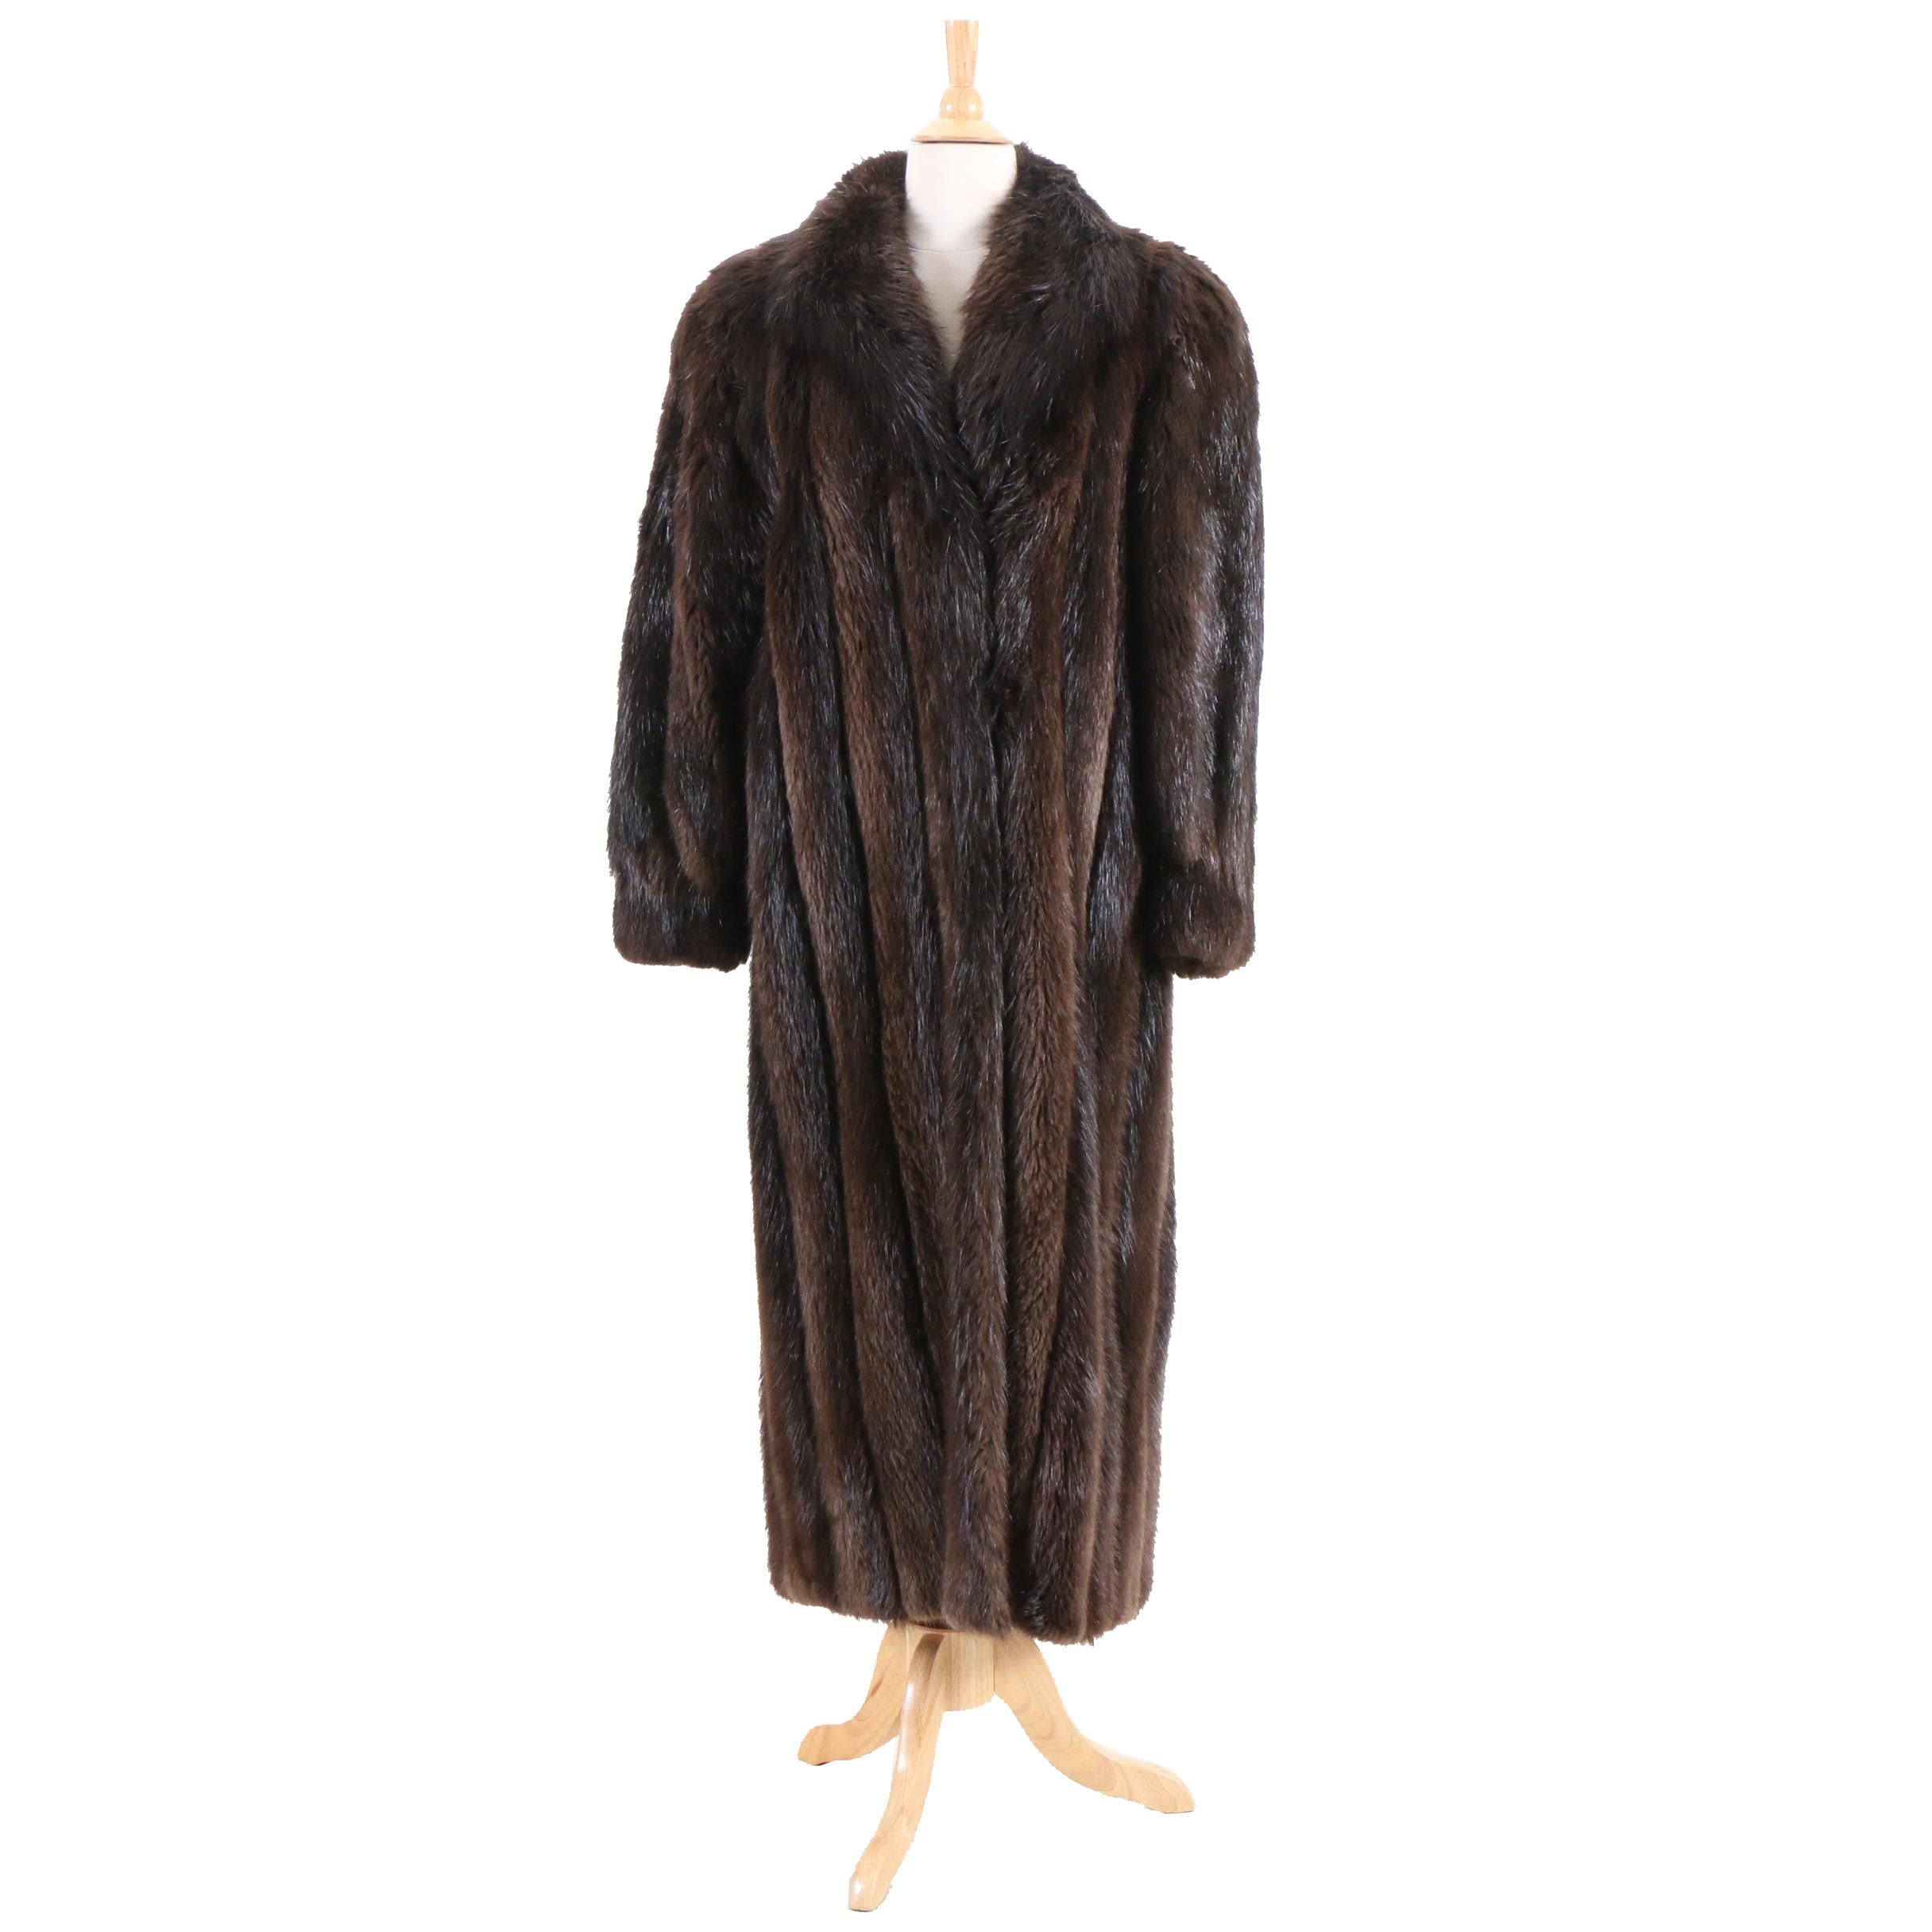 Basile Beaver Fur Coat, Vintage